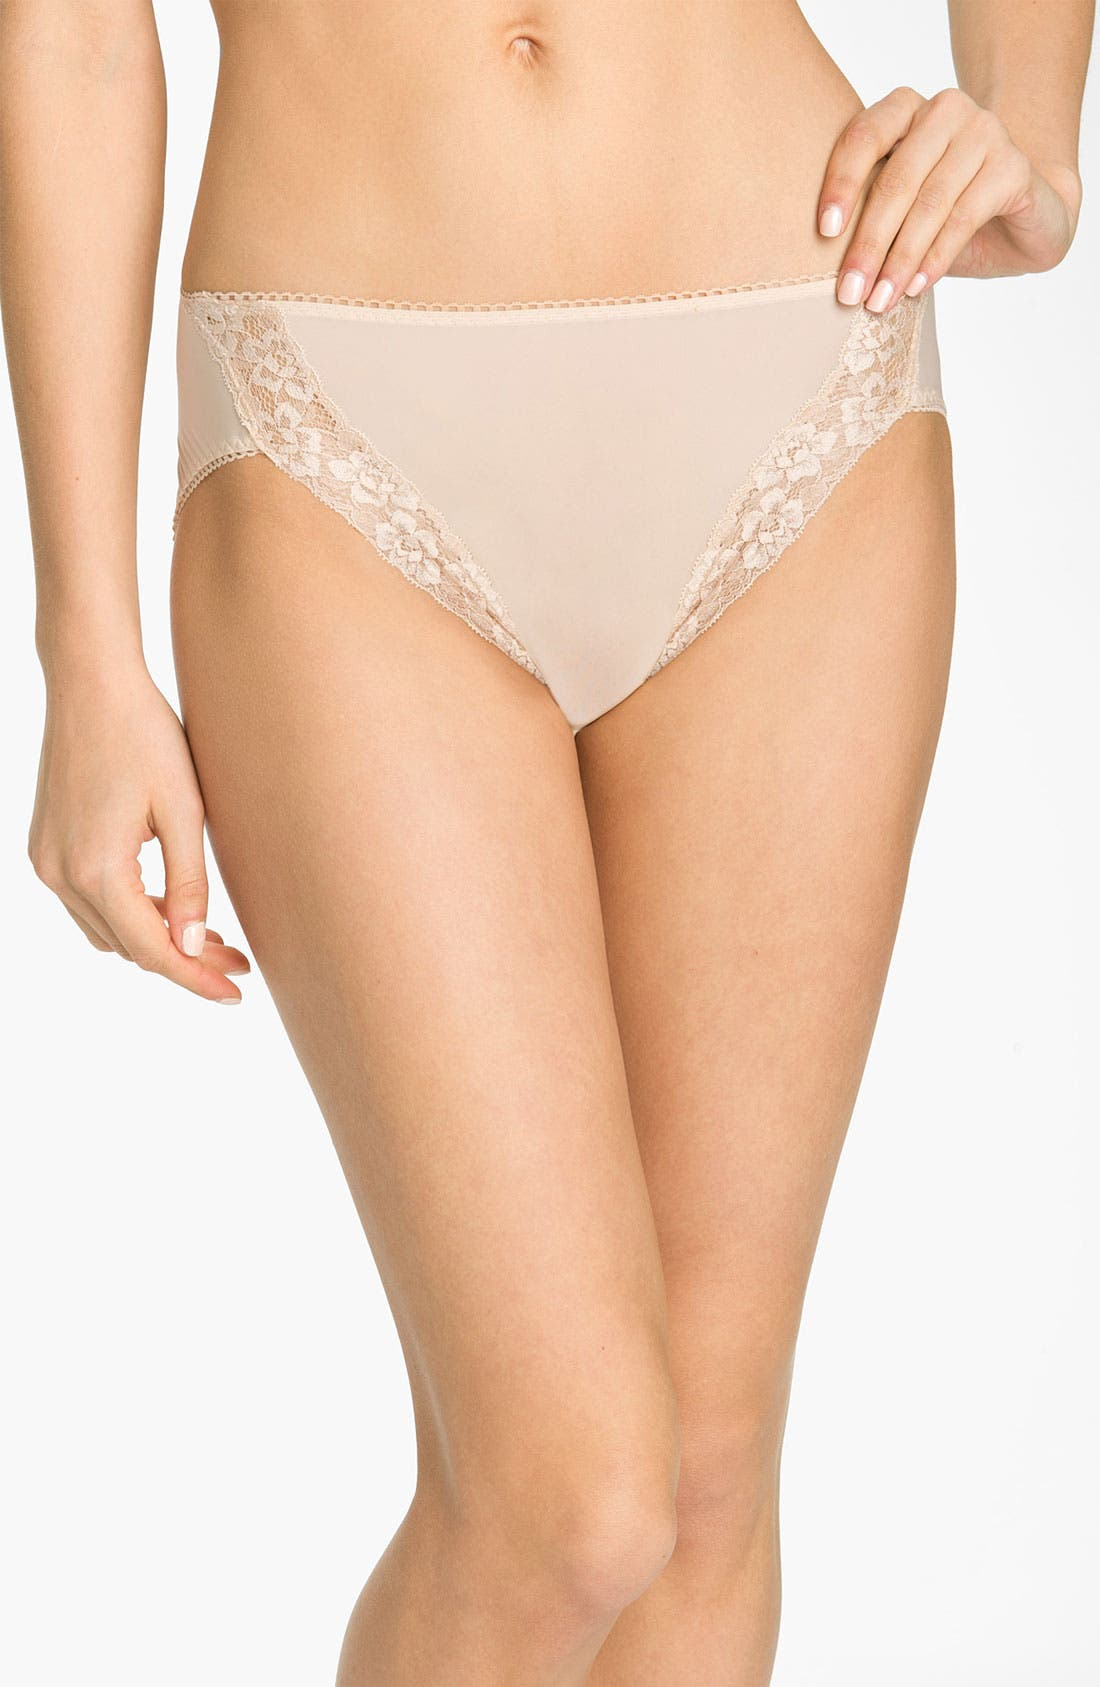 'Bodysuede' Lace Trim High Cut Briefs,                         Main,                         color, Natural Nude